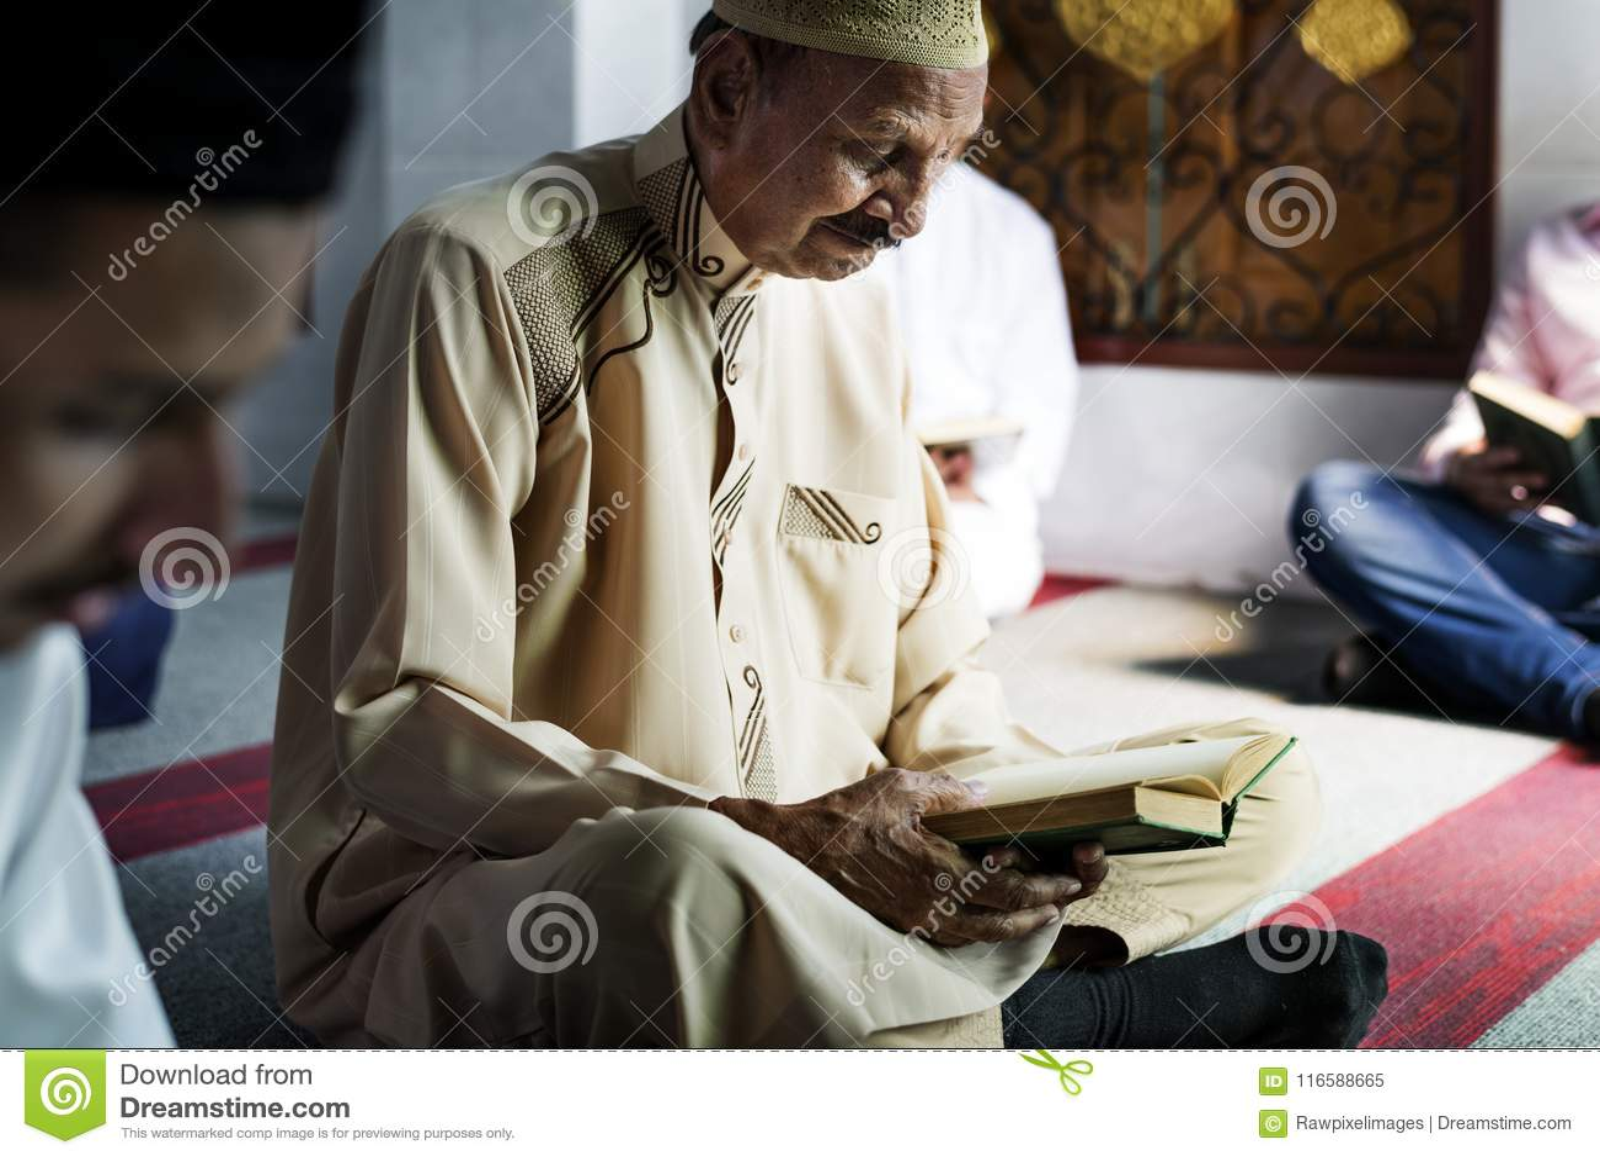 Muslim men reading Quran during Ramadan